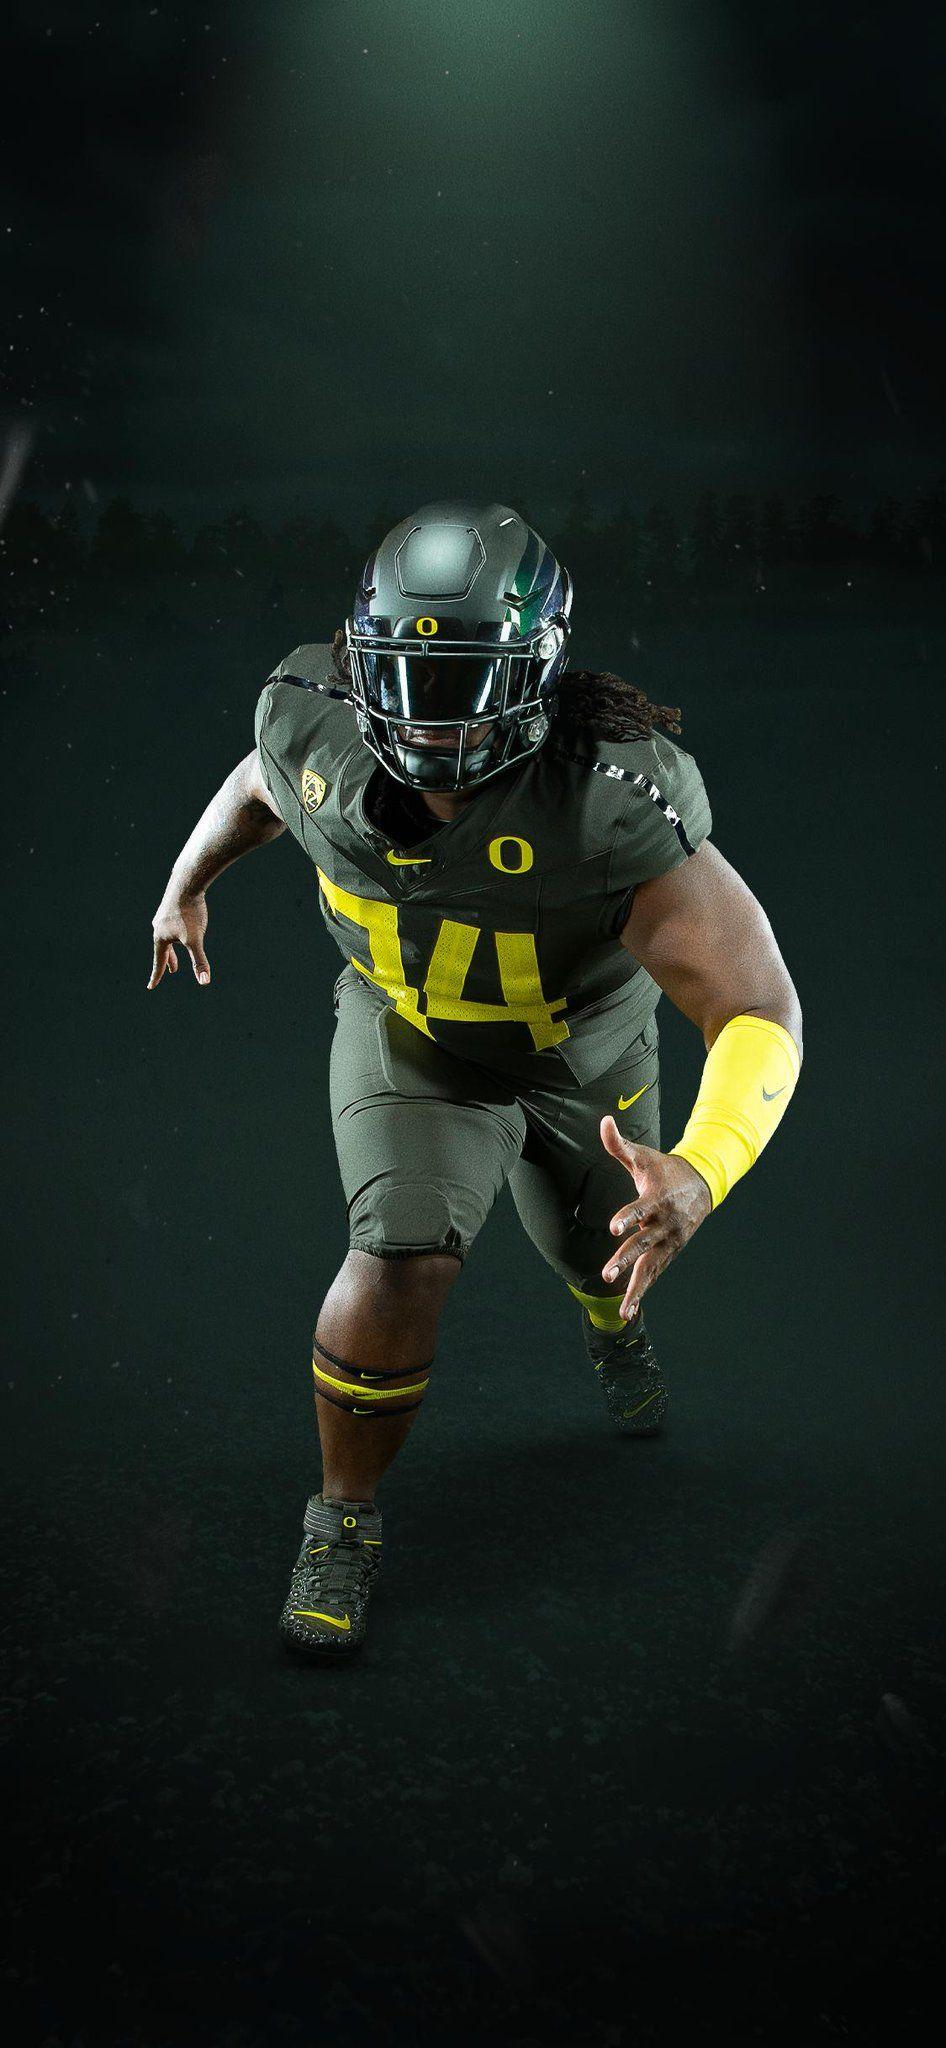 2019 University Of Oregon Ducks Football Uniforms All Nightmare Green Oregon Ducks Uniforms Oregon Ducks Football Oregon Ducks